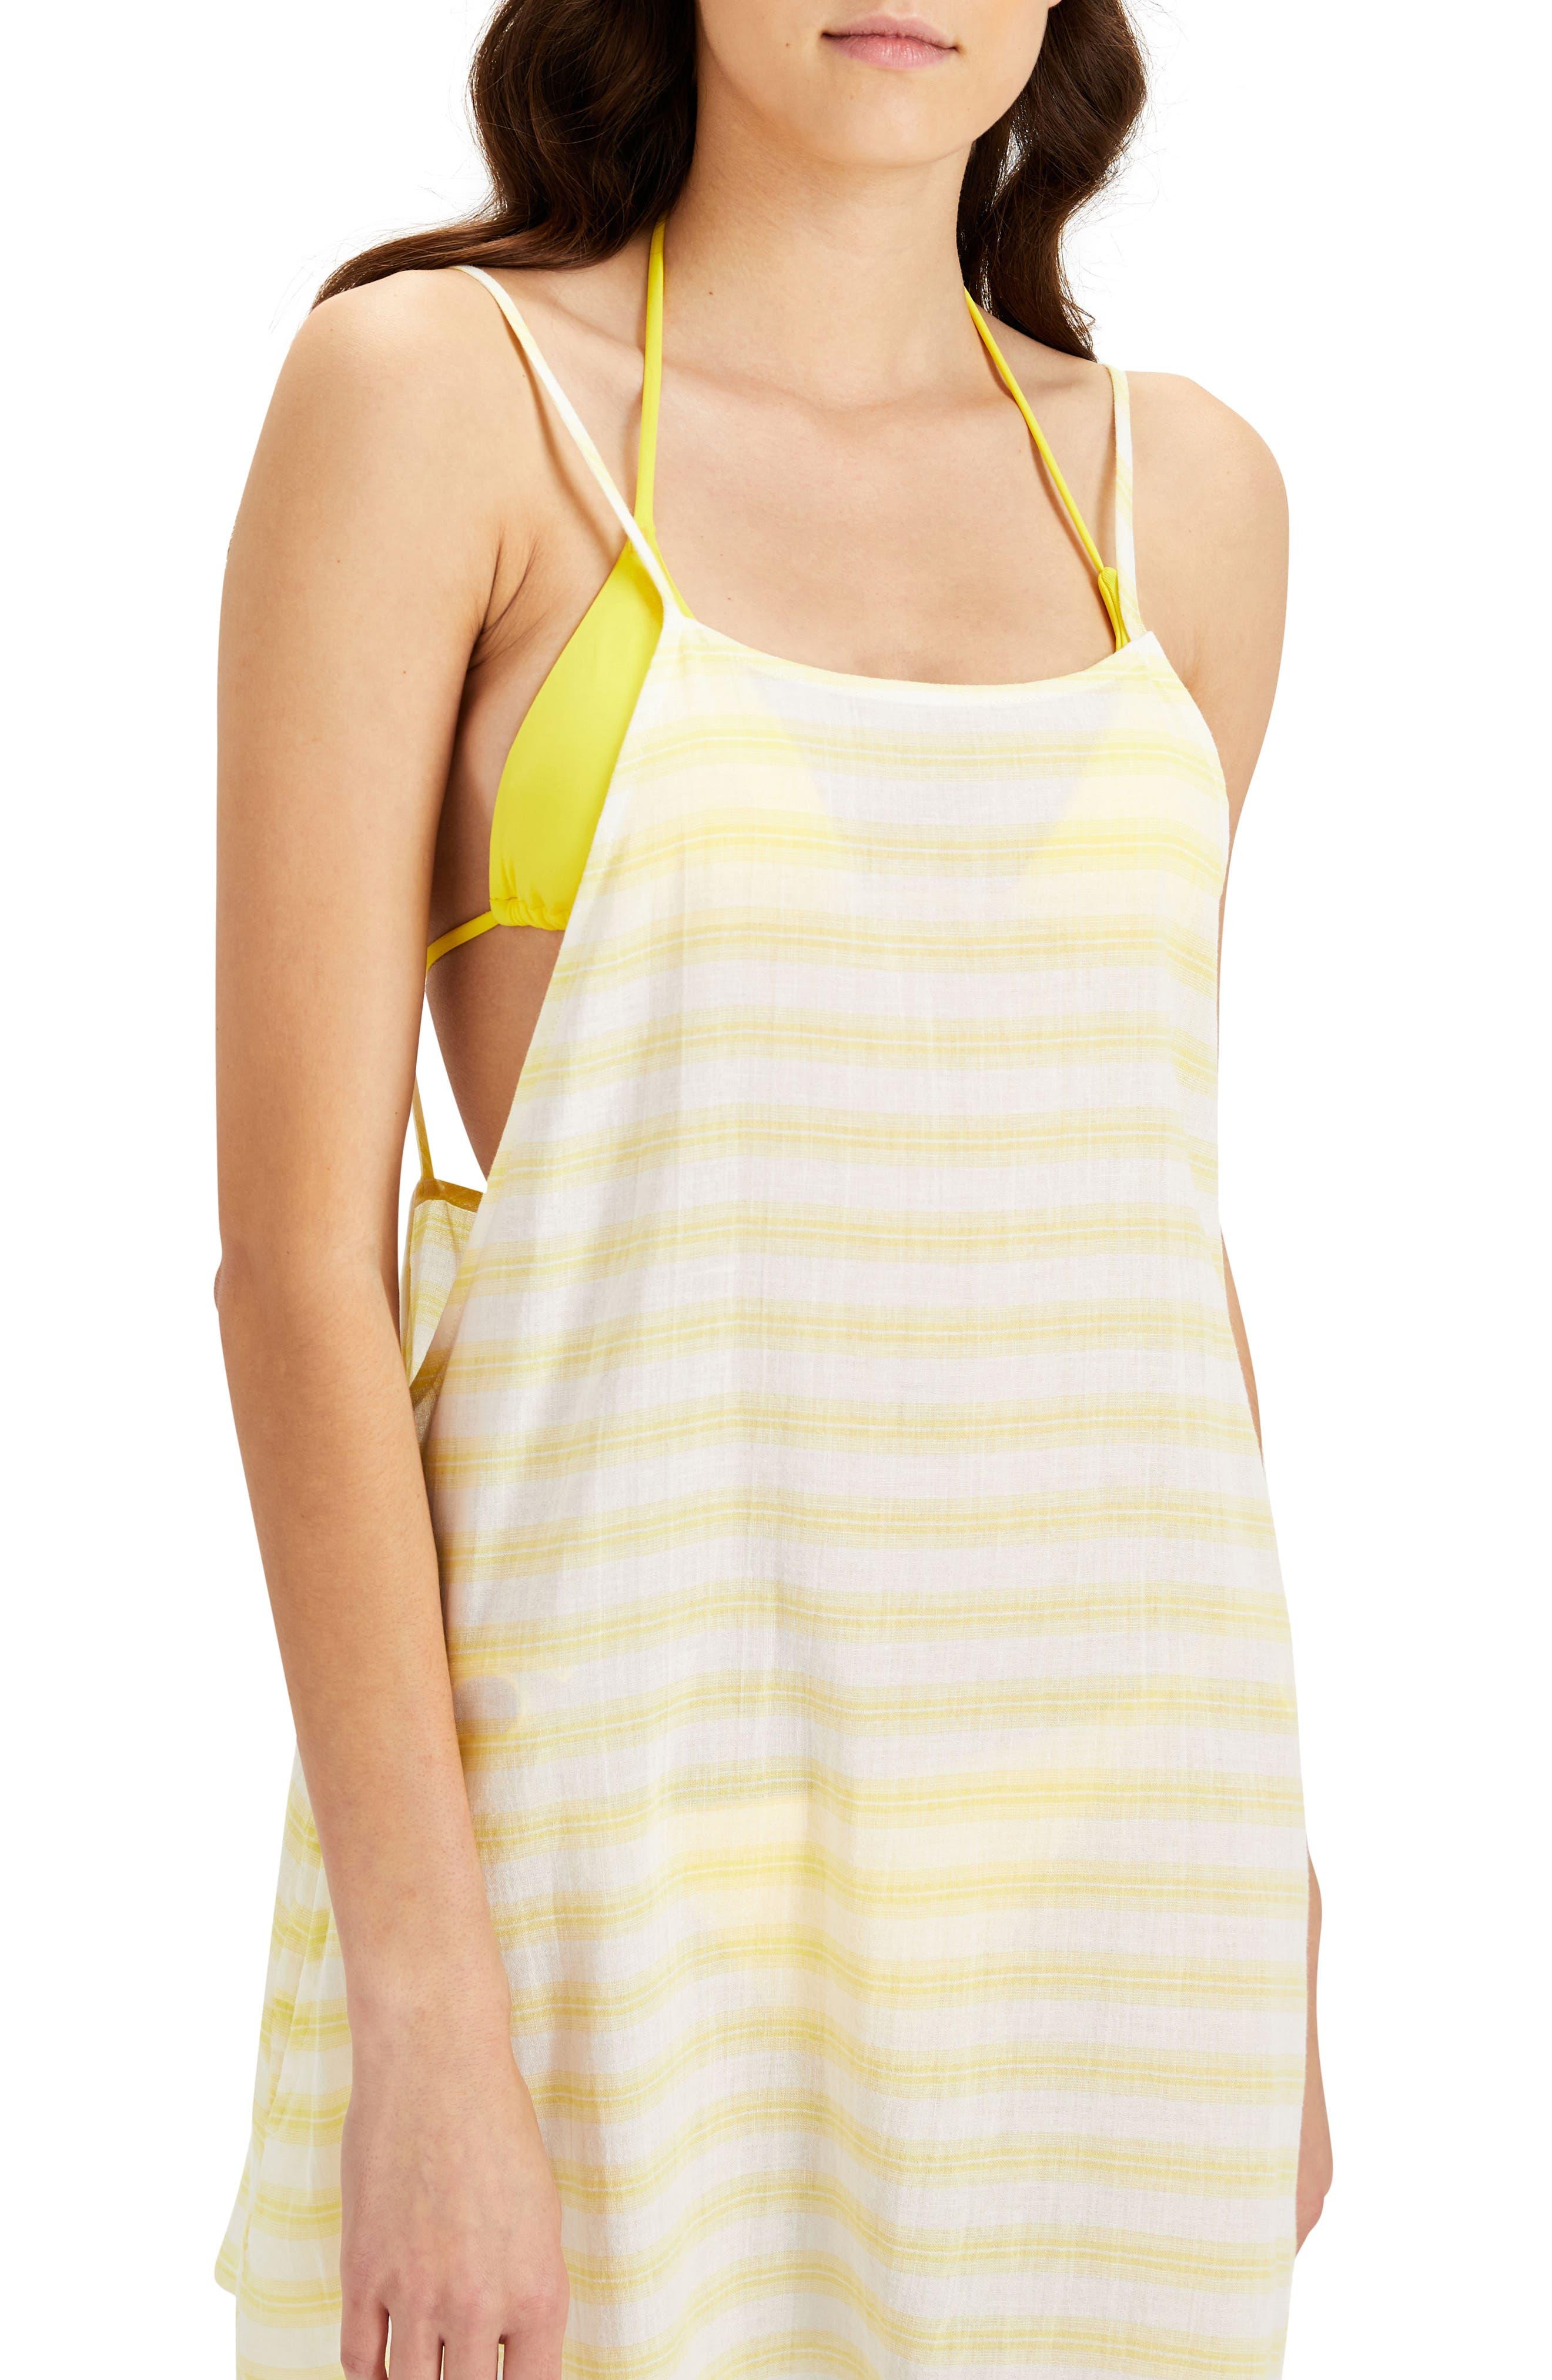 Sasha Cover-Up Shirtdress,                             Alternate thumbnail 3, color,                             Citrus/ White